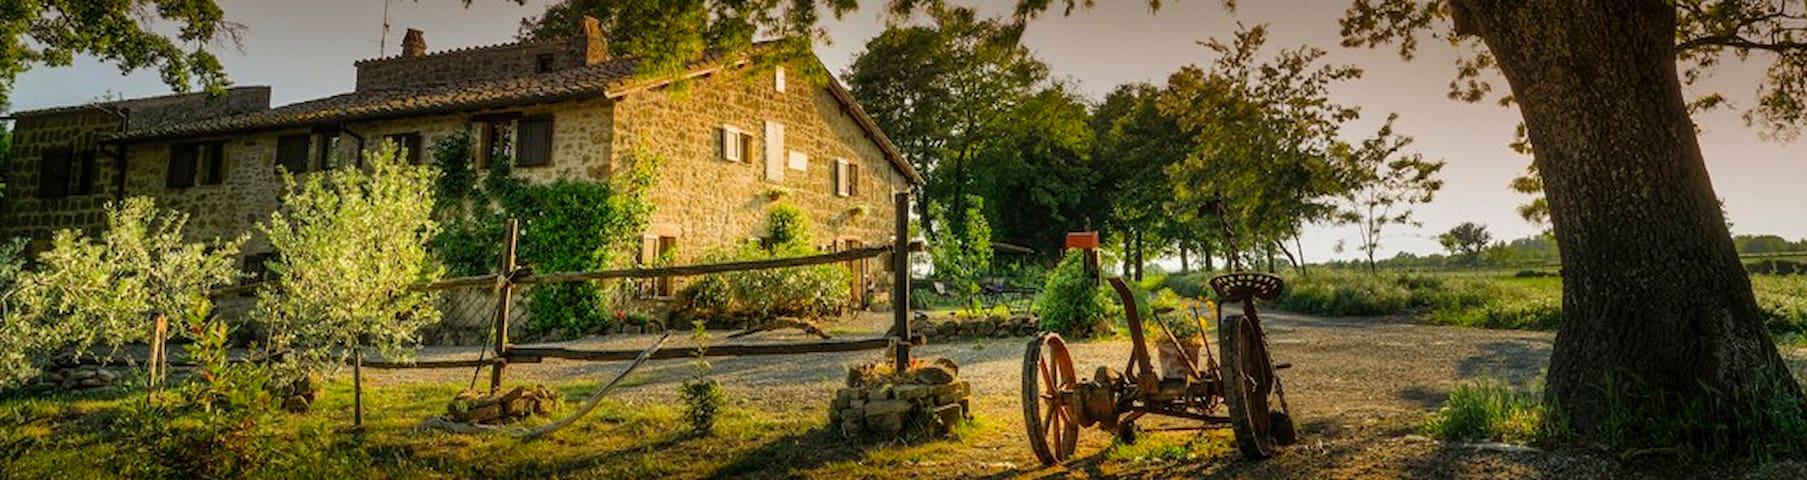 Tuscany Organic farm Sant'Egle - Sorano - House